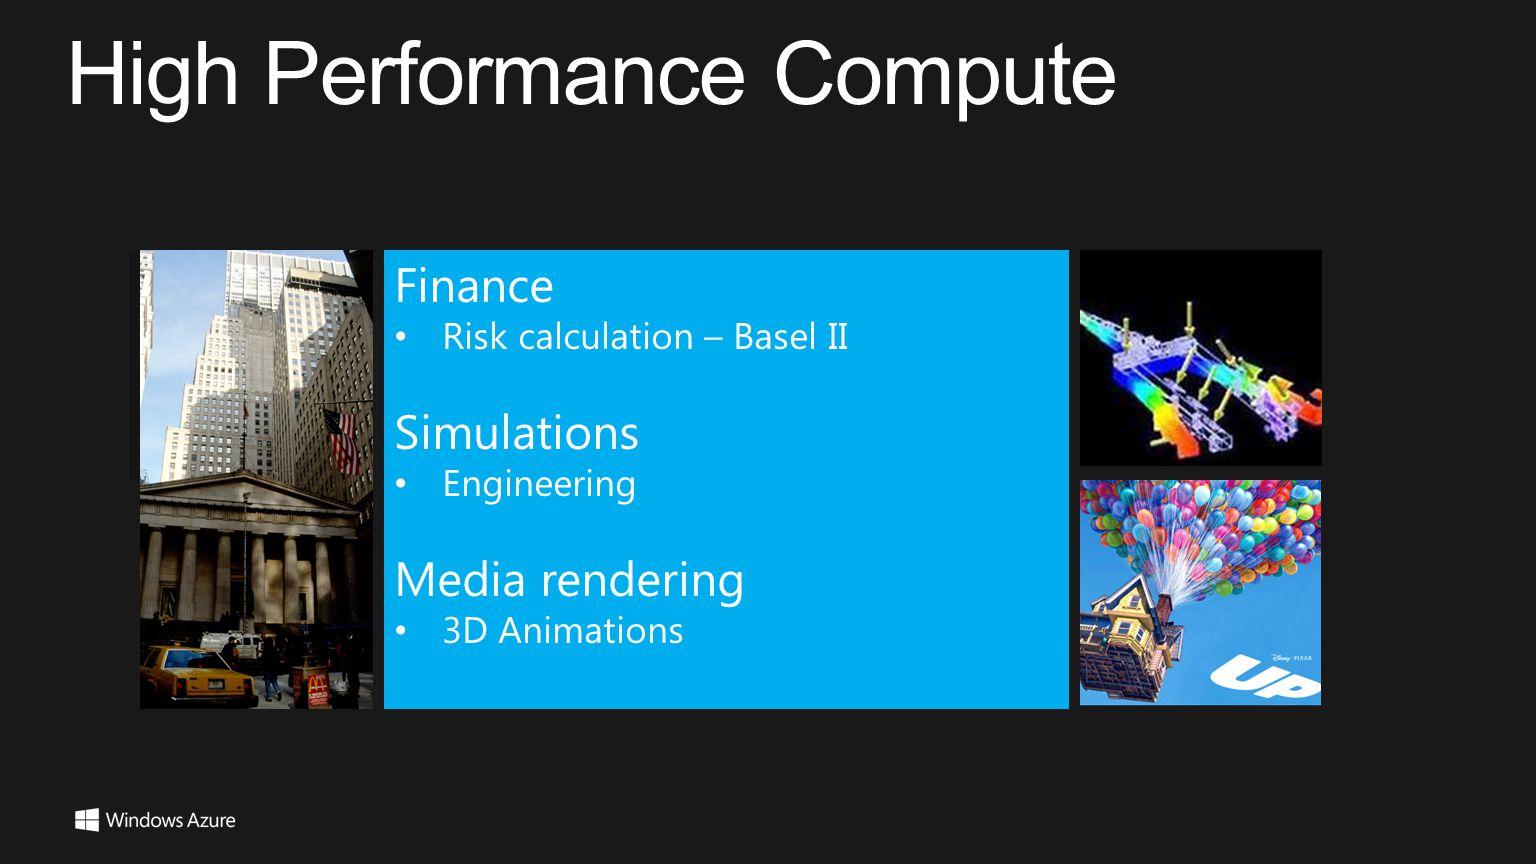 High Performance Compute